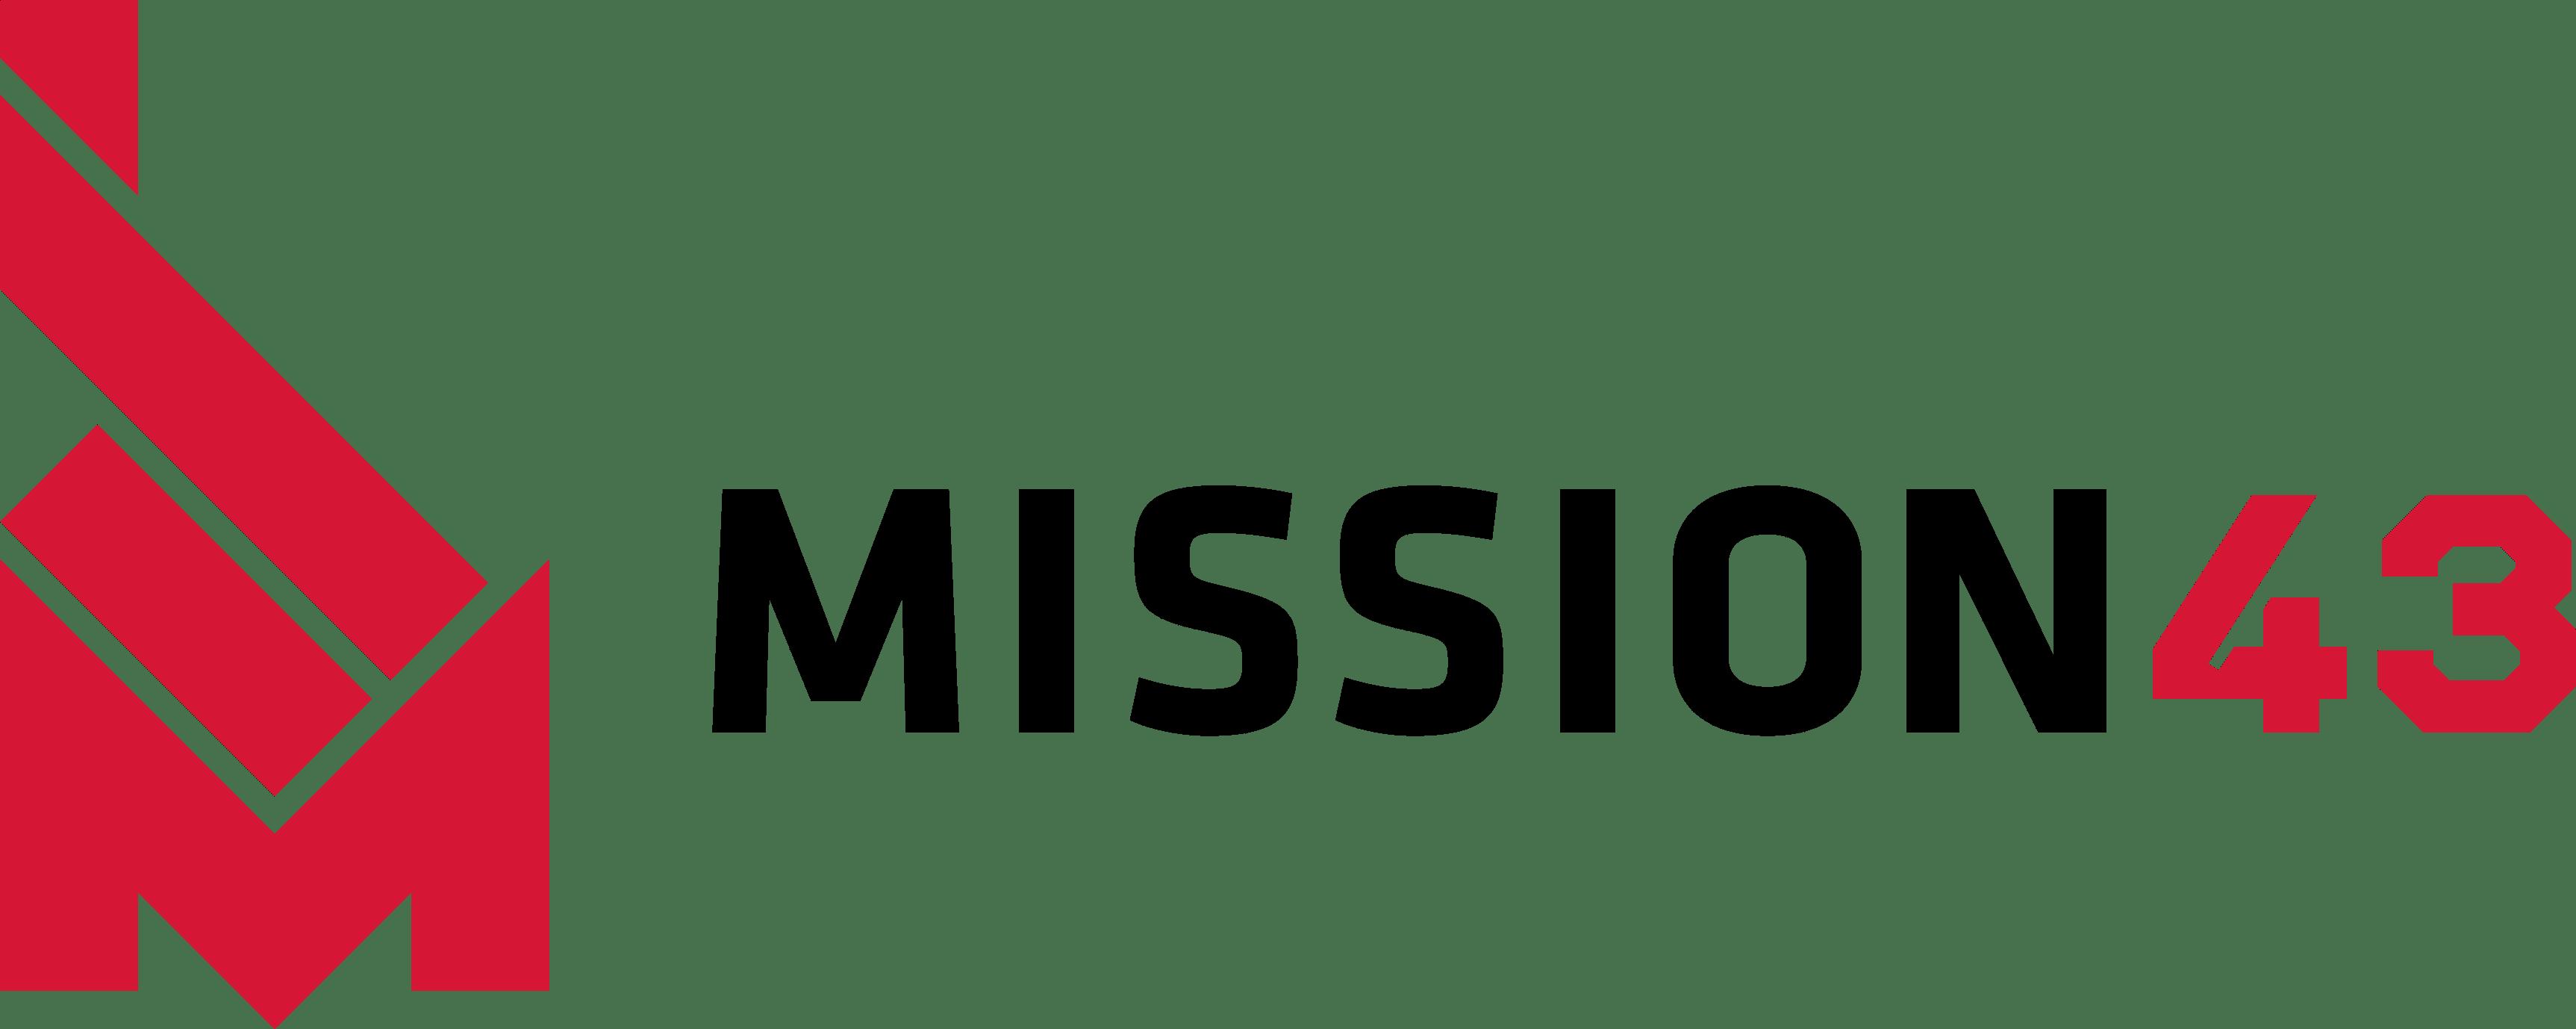 Mission43_Logo_Horizontal_colorcopy_3451x